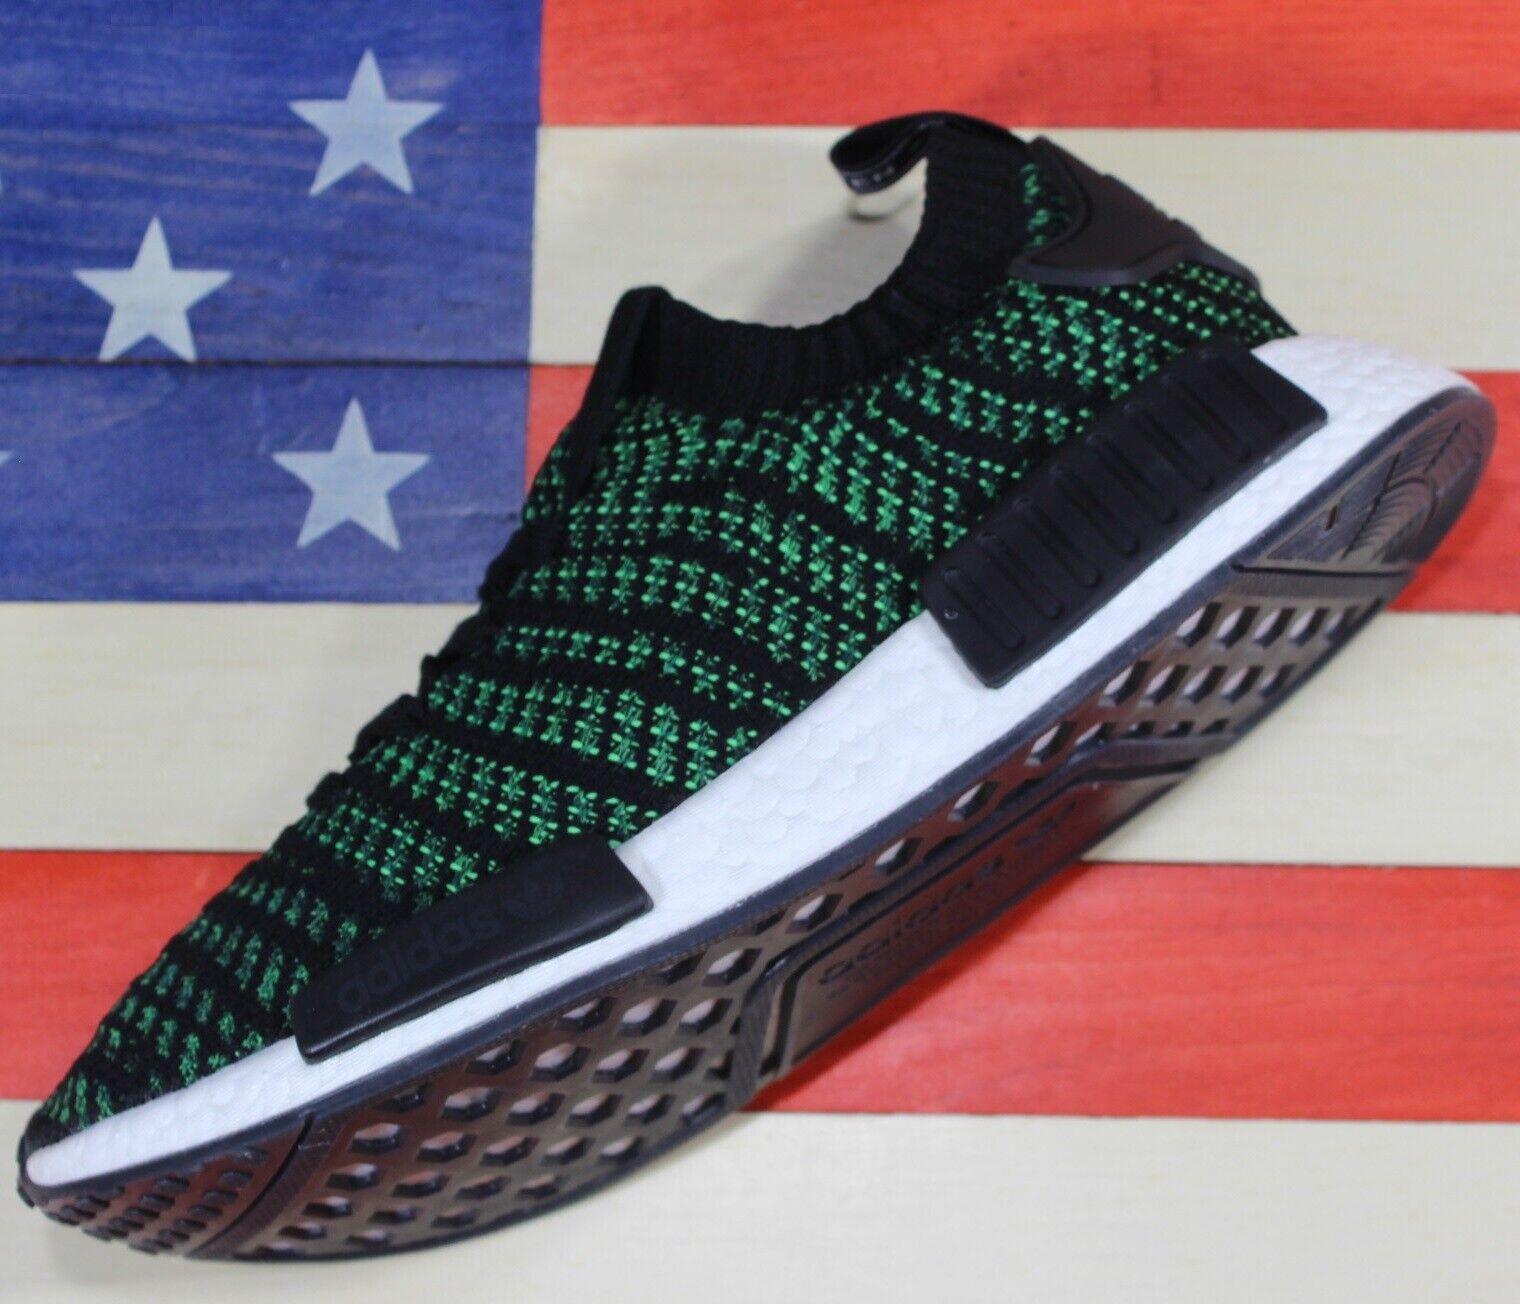 Adidas Originals NMD R1 Boost Men's Training shoes Night-Cargo Green Cargo AQ0936